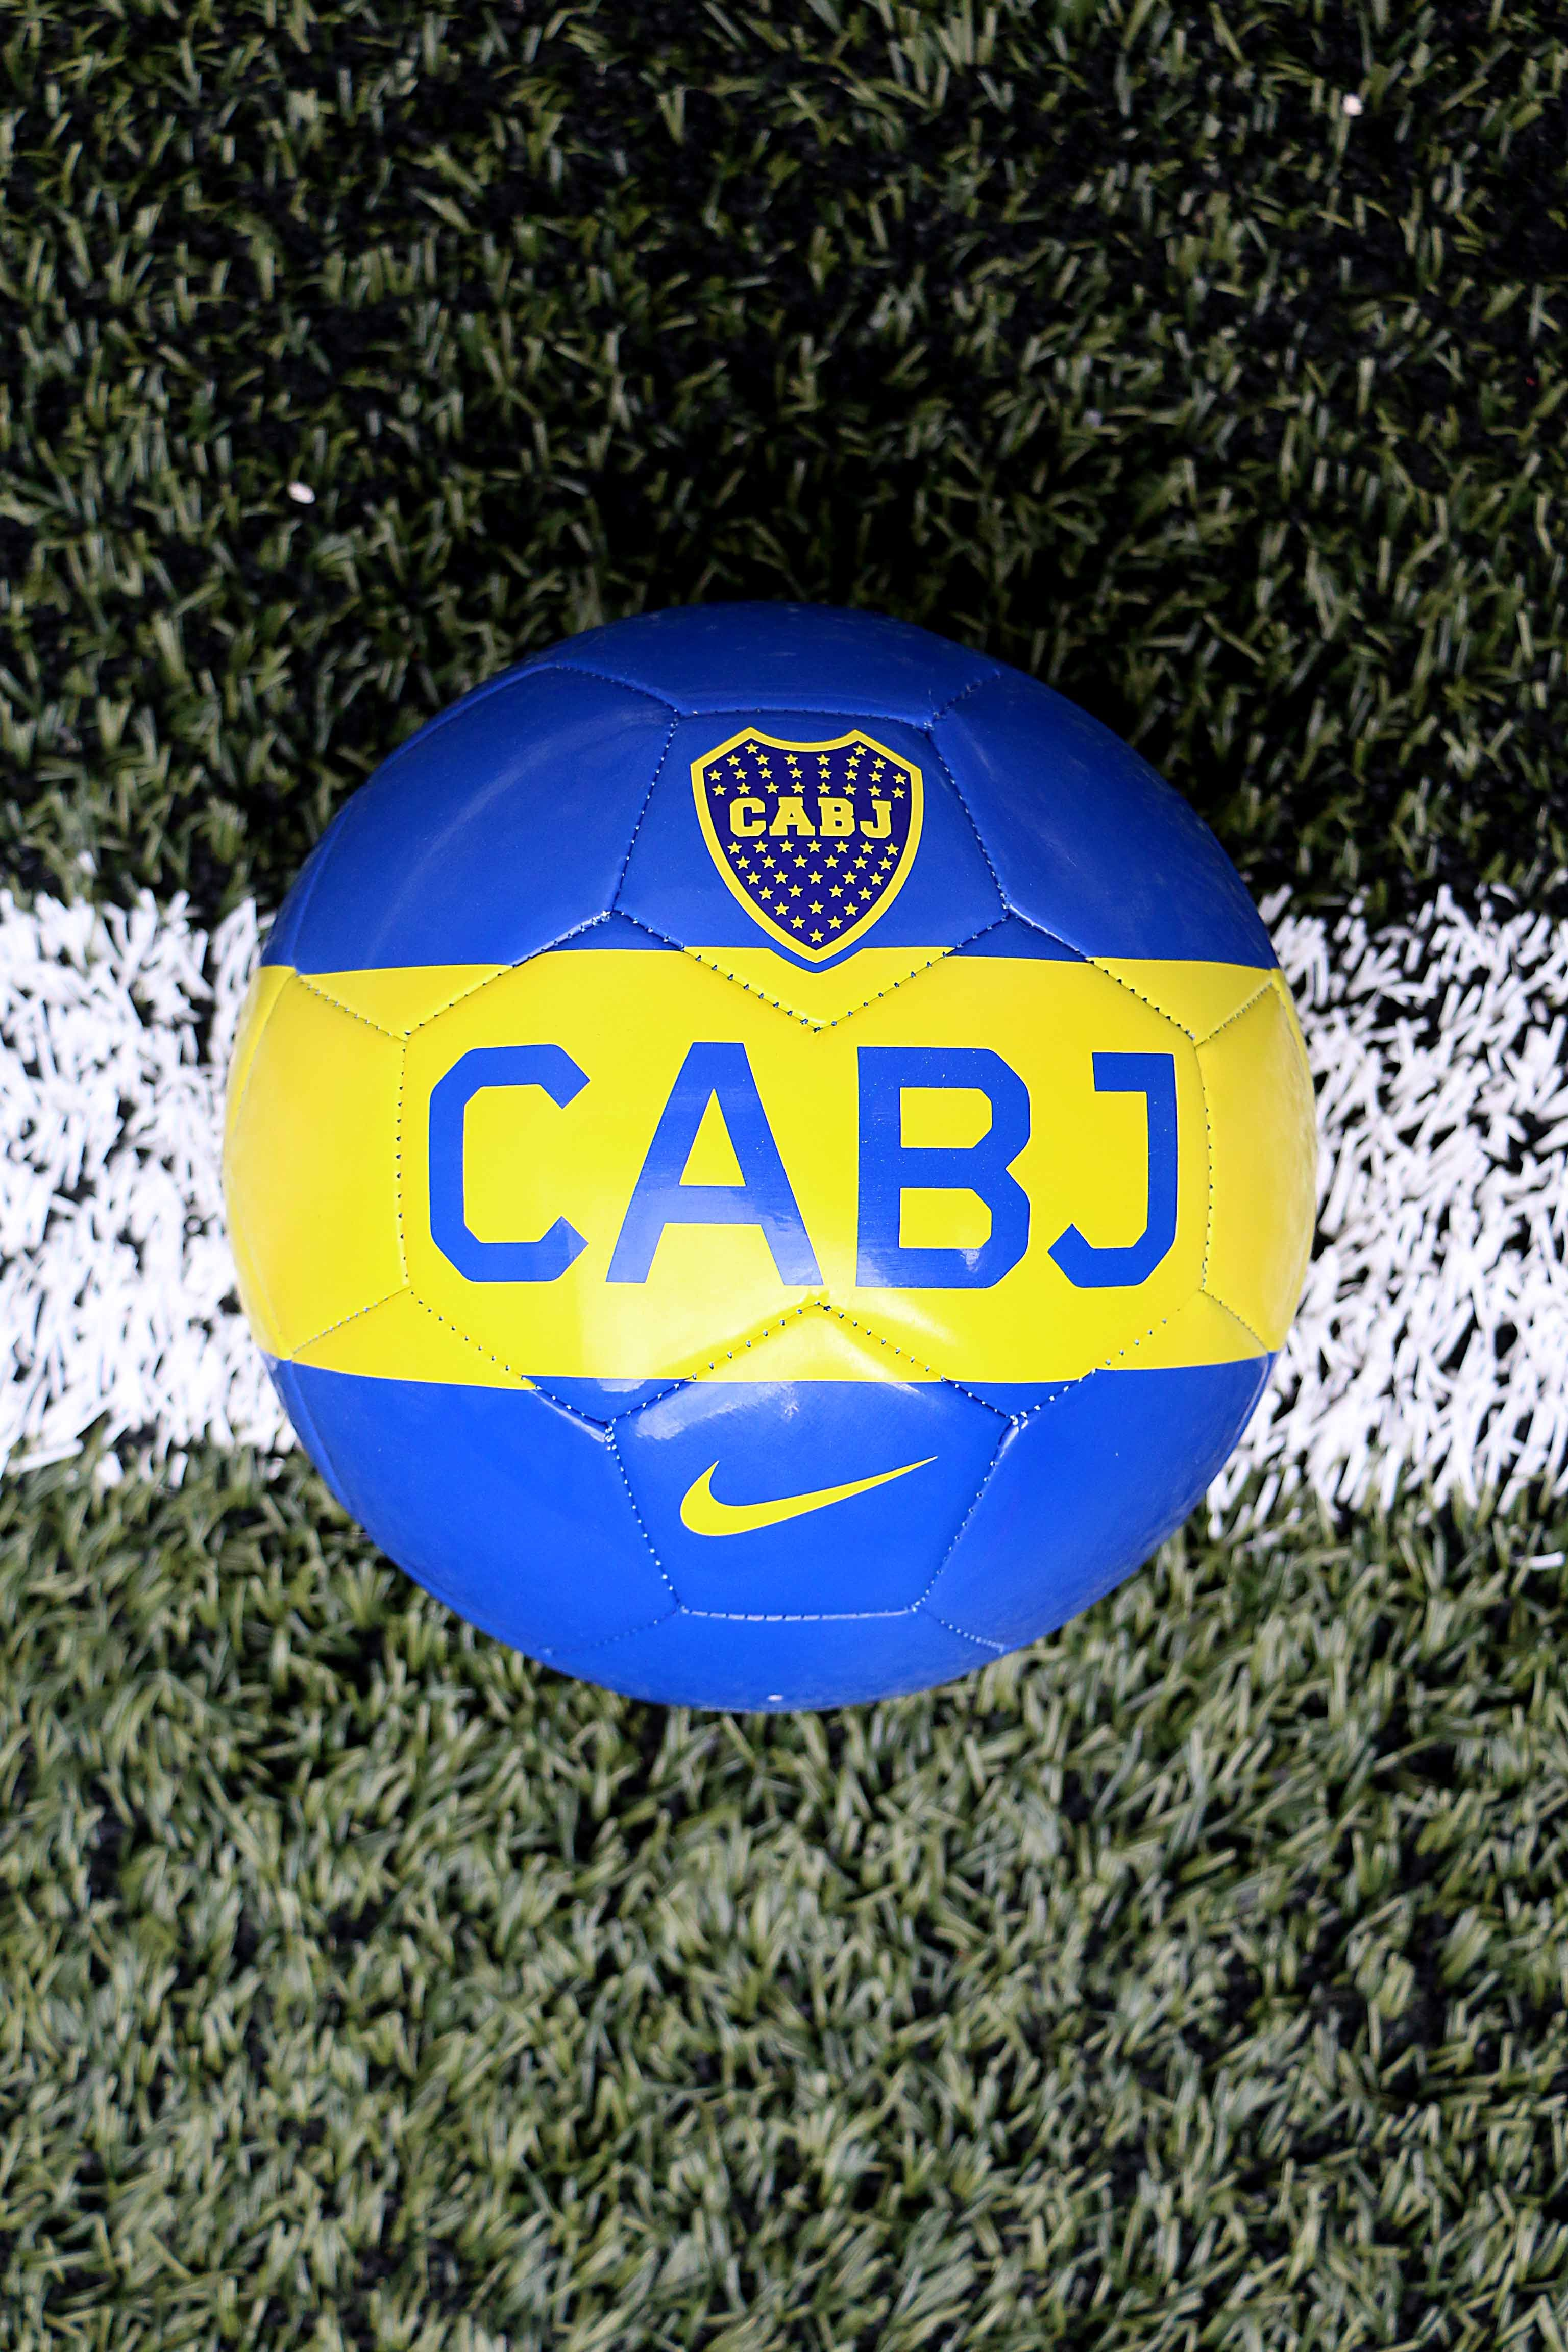 Real Madrid · Balón Nike Boca Juniors Sports Talla 5 Balones Nike c636c52d85f